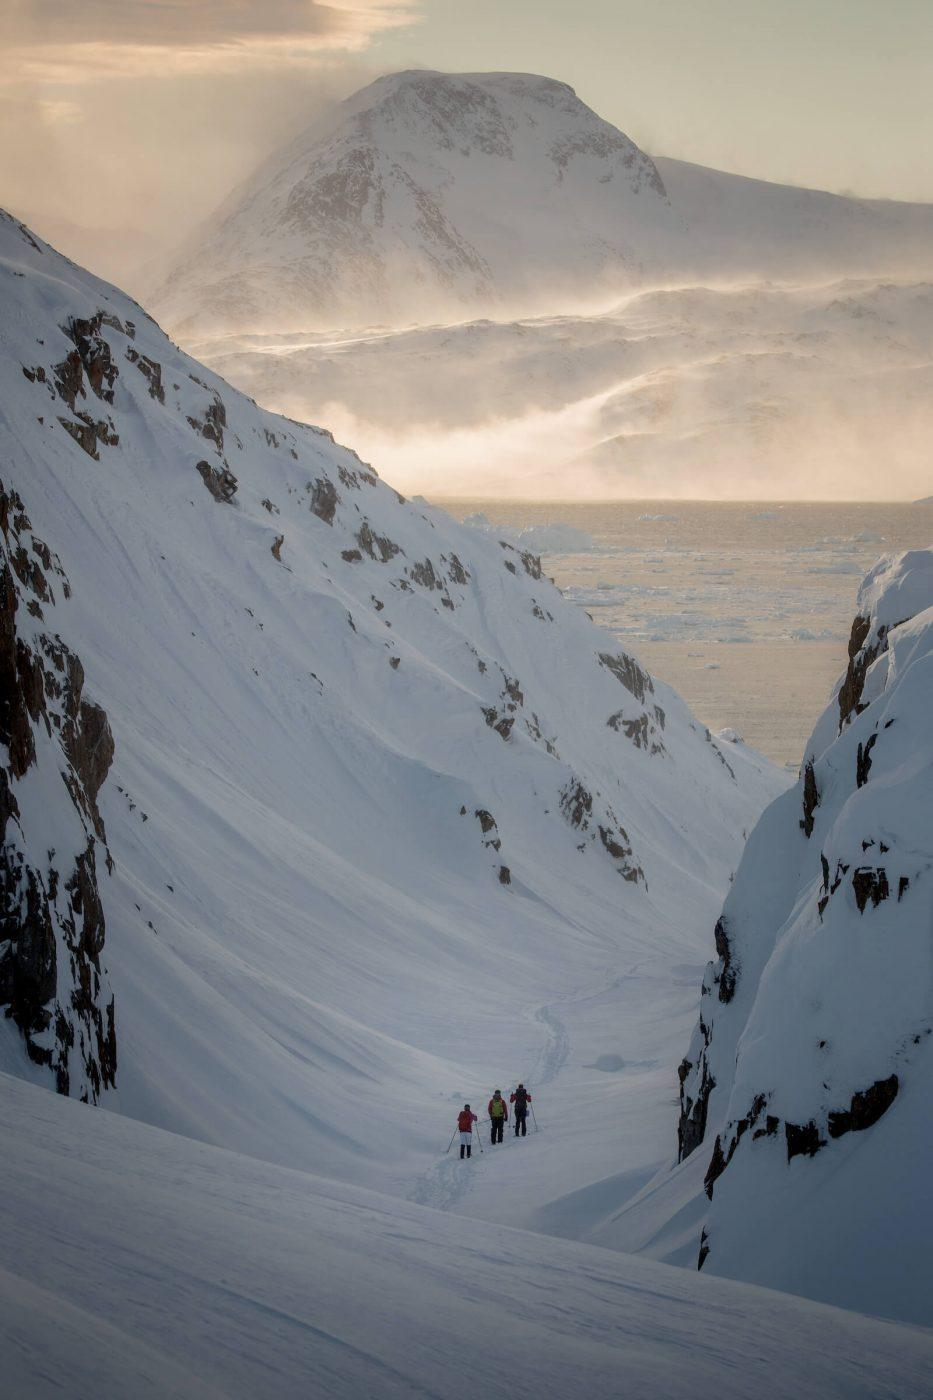 Skiers in a narrow valley near Sermilik Ice Fjord in East Greenland